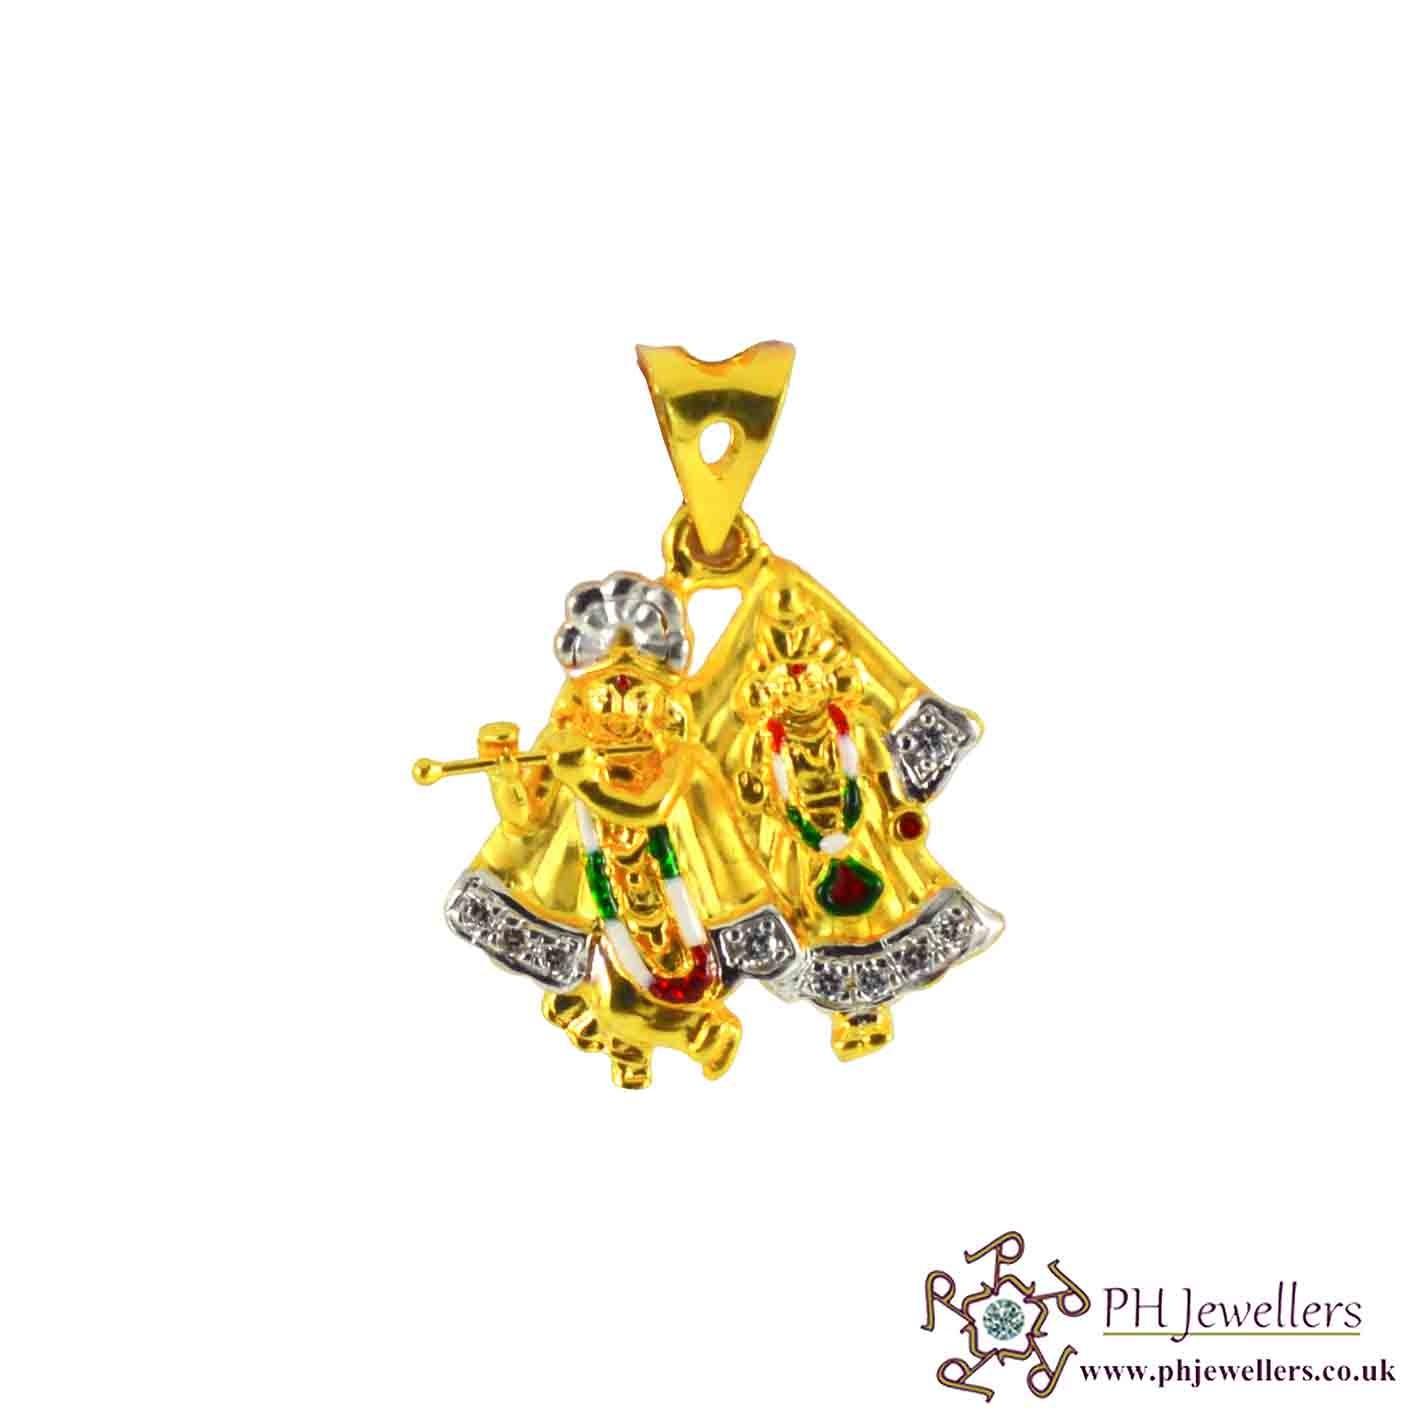 Online gold jewellery gold jewellery religious 22ct 916 hallmark online gold jewellery gold jewellery religious 22ct 916 hallmark yellow gold radha krishna rhodium pendant cz rp31 22 carat gold jewellers aloadofball Choice Image